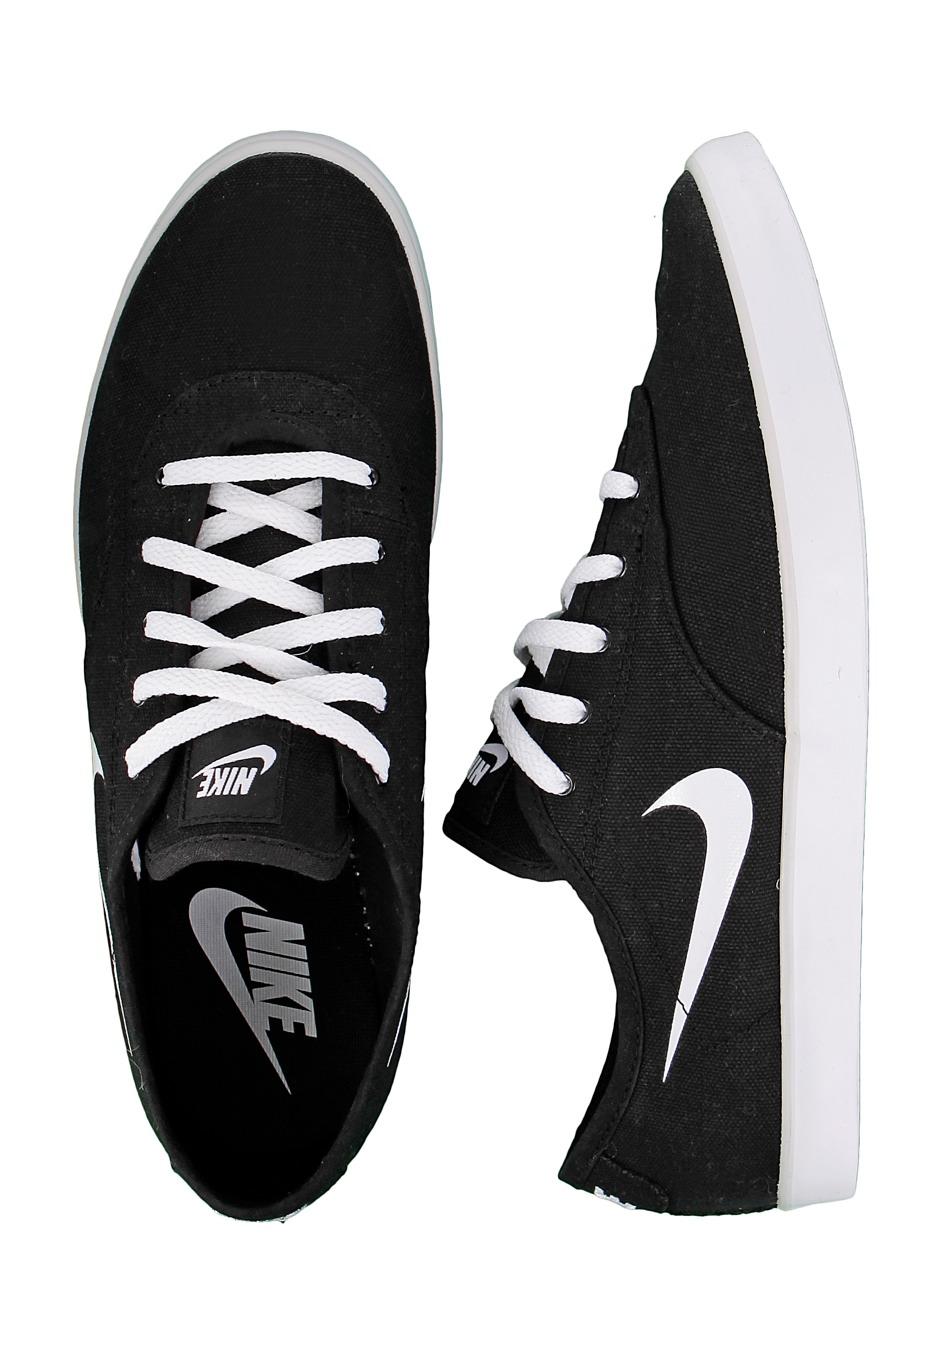 Nike - Starlet Saddle Black/White - Girl Schuhe - Offizieller Streetwear Online Shop - Impericon.com